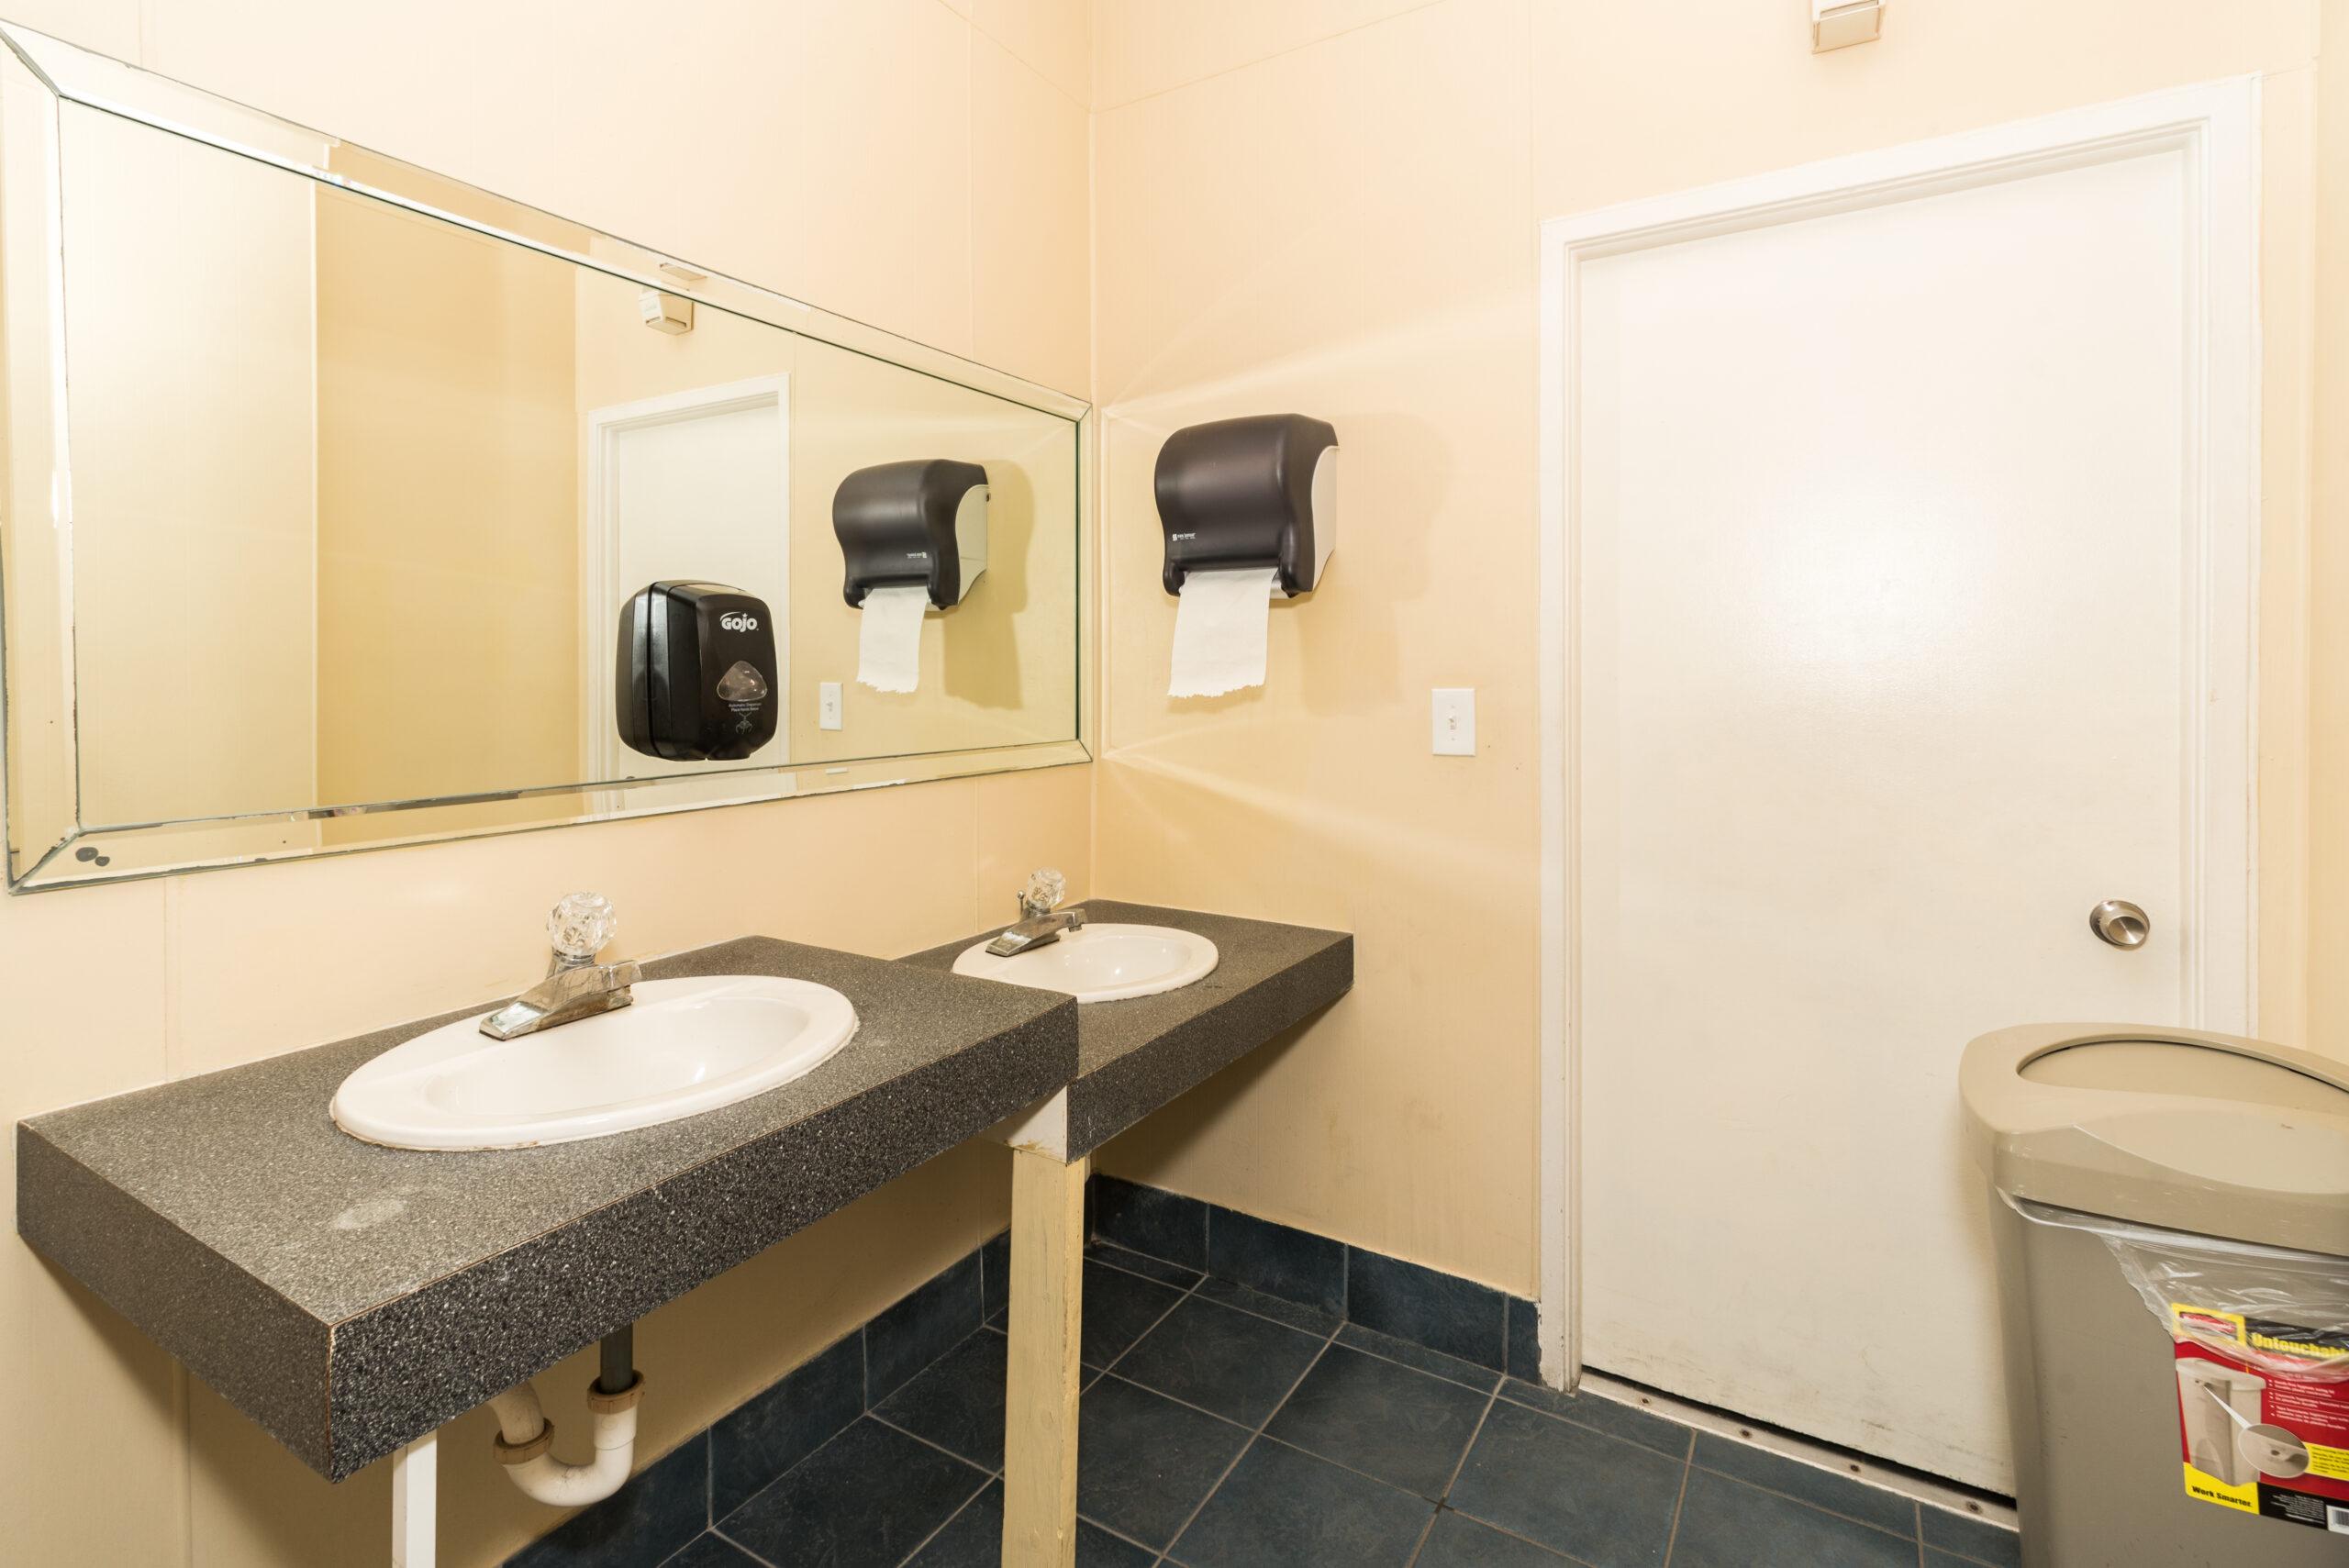 Sunny Isles BAthroom Remodel